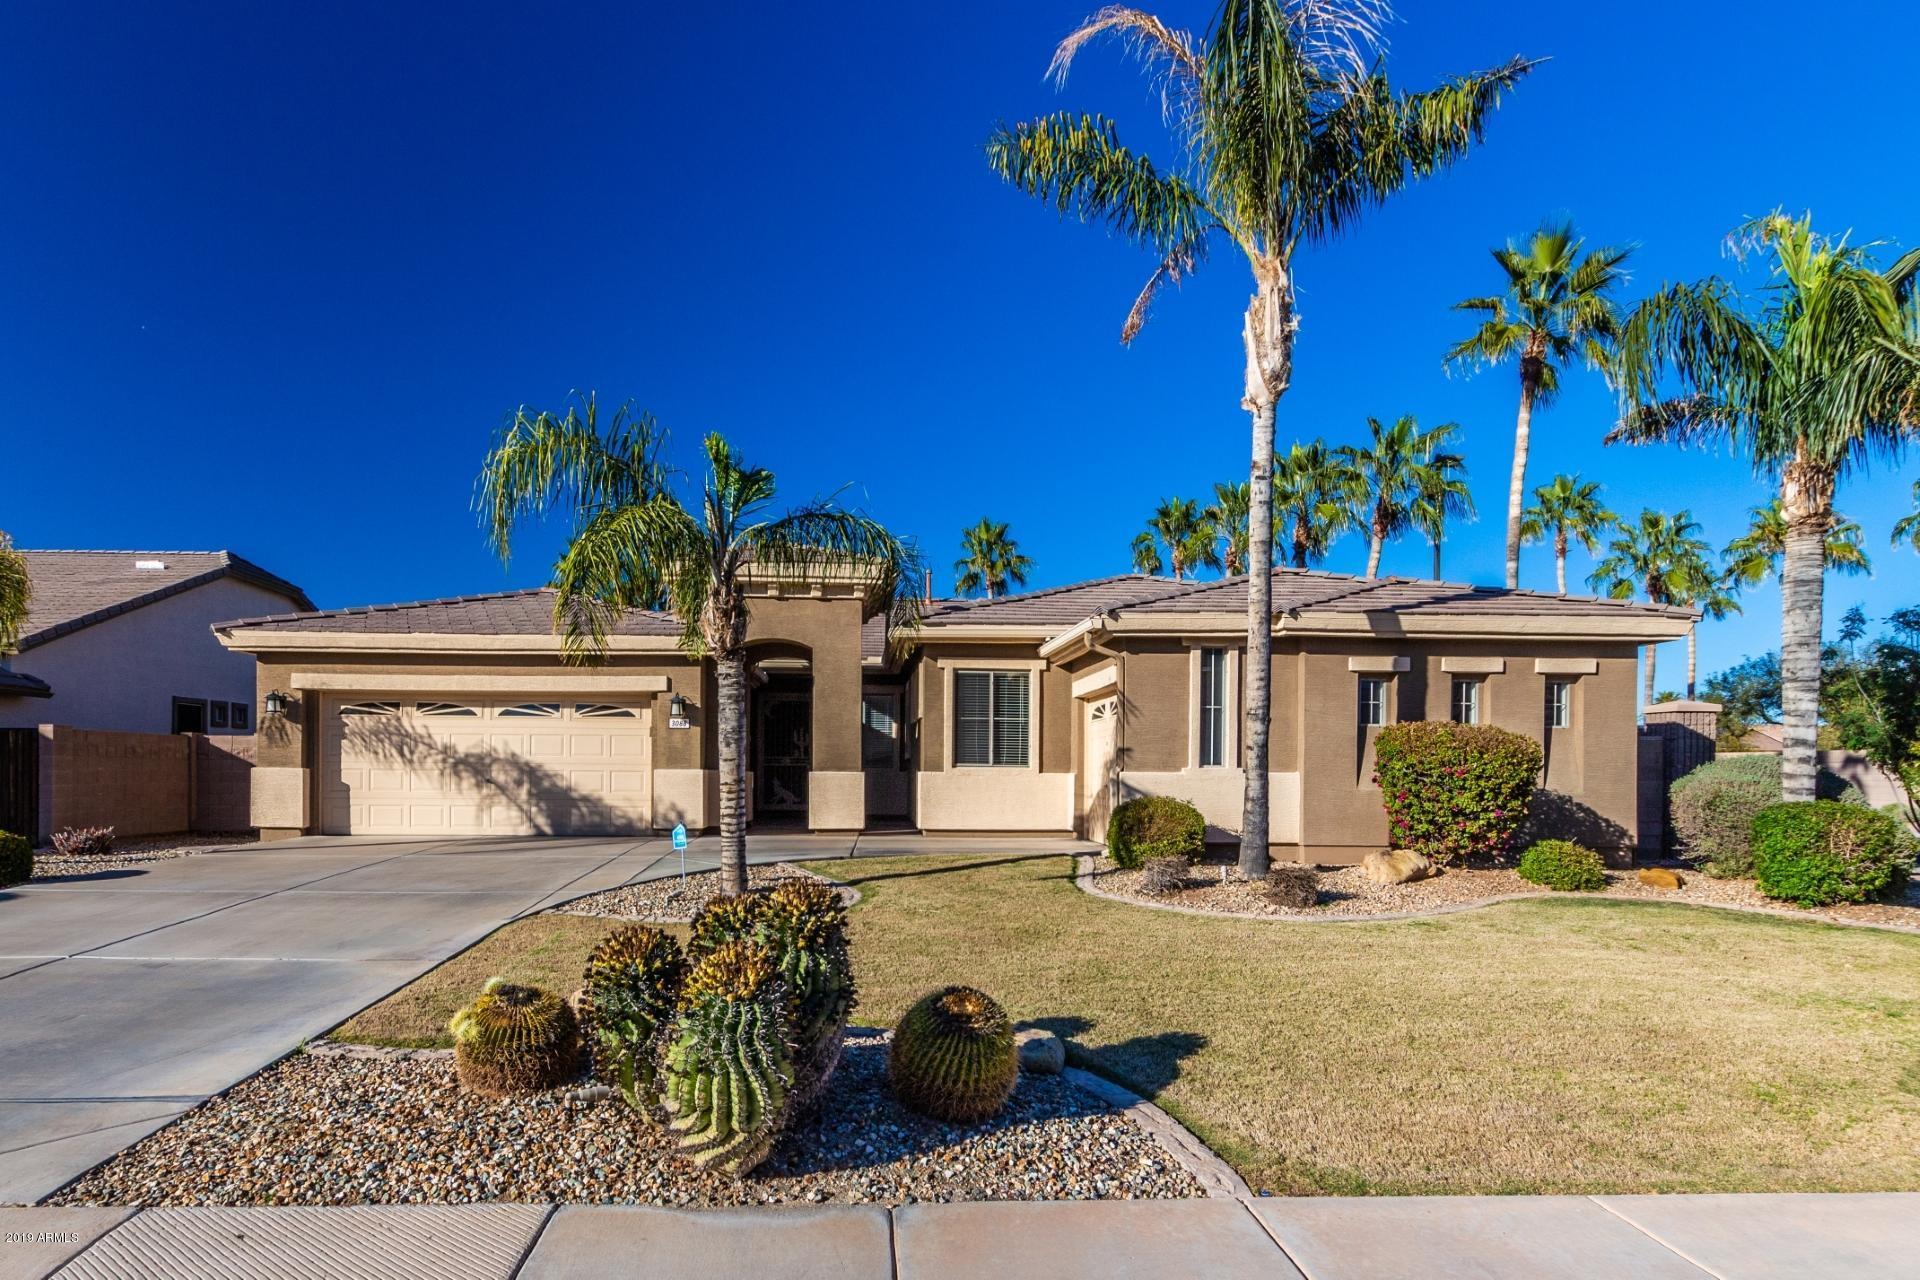 Photo of 3088 E JUANITA Avenue, Gilbert, AZ 85234